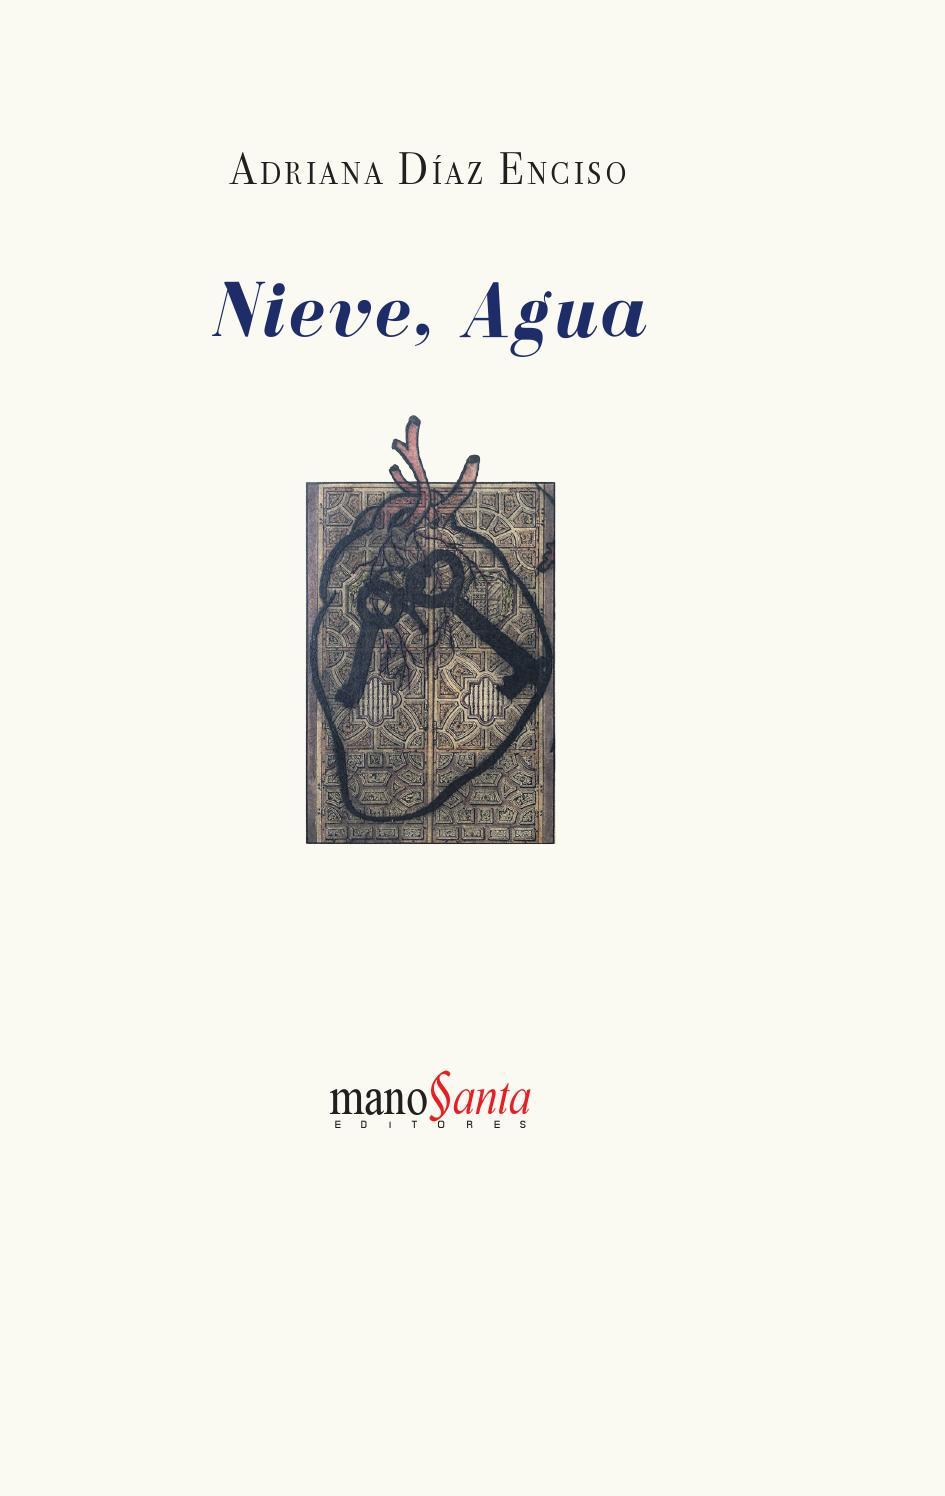 Adriana Díaz Enciso. Nieve, Agua by Mano Santa Editores - issuu